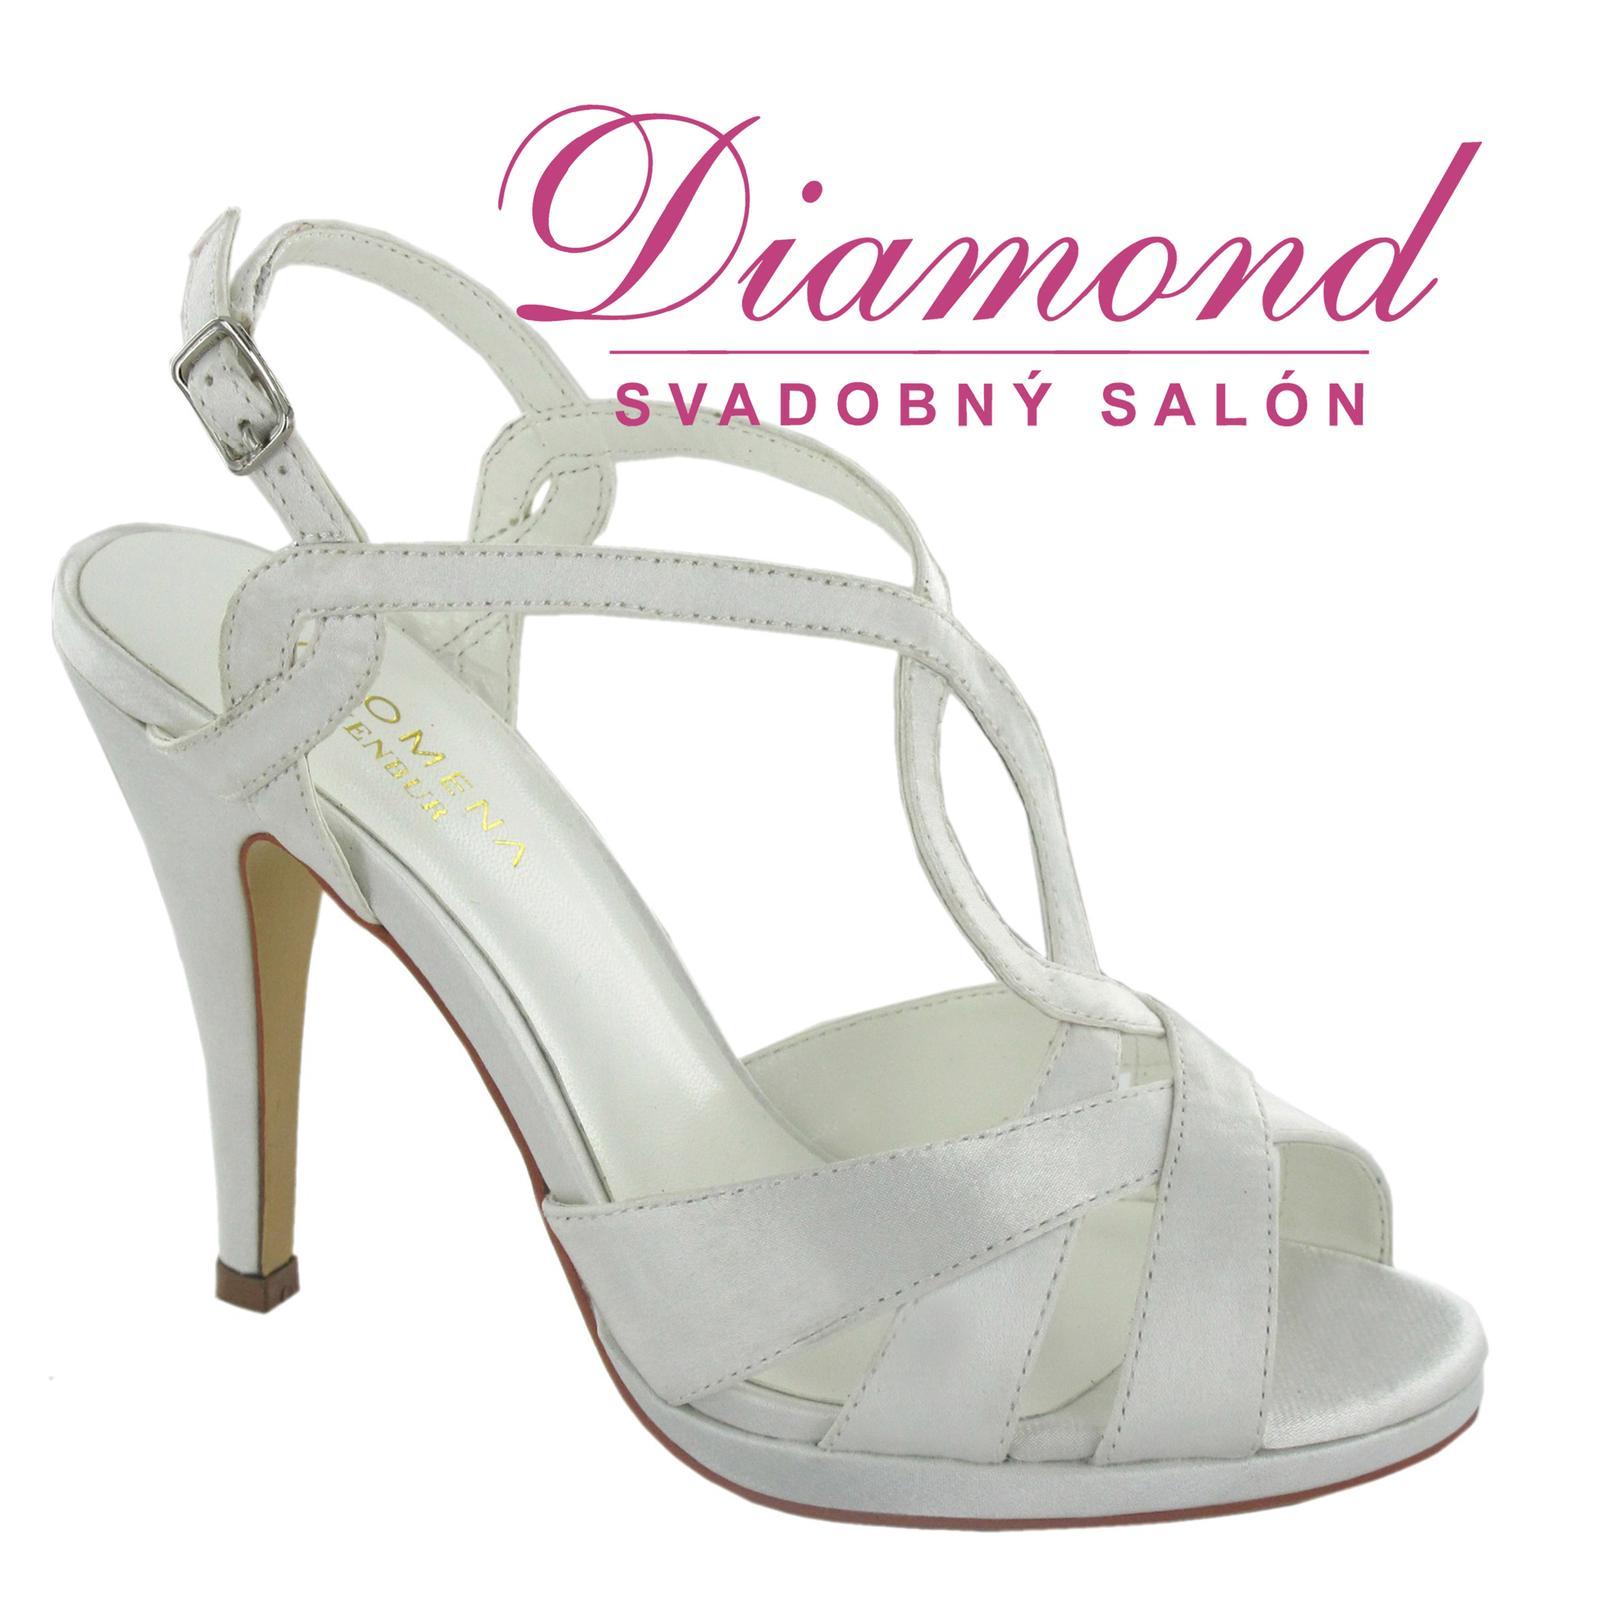 Svadobné topánky Amparo (6267) - Obrázok č. 1